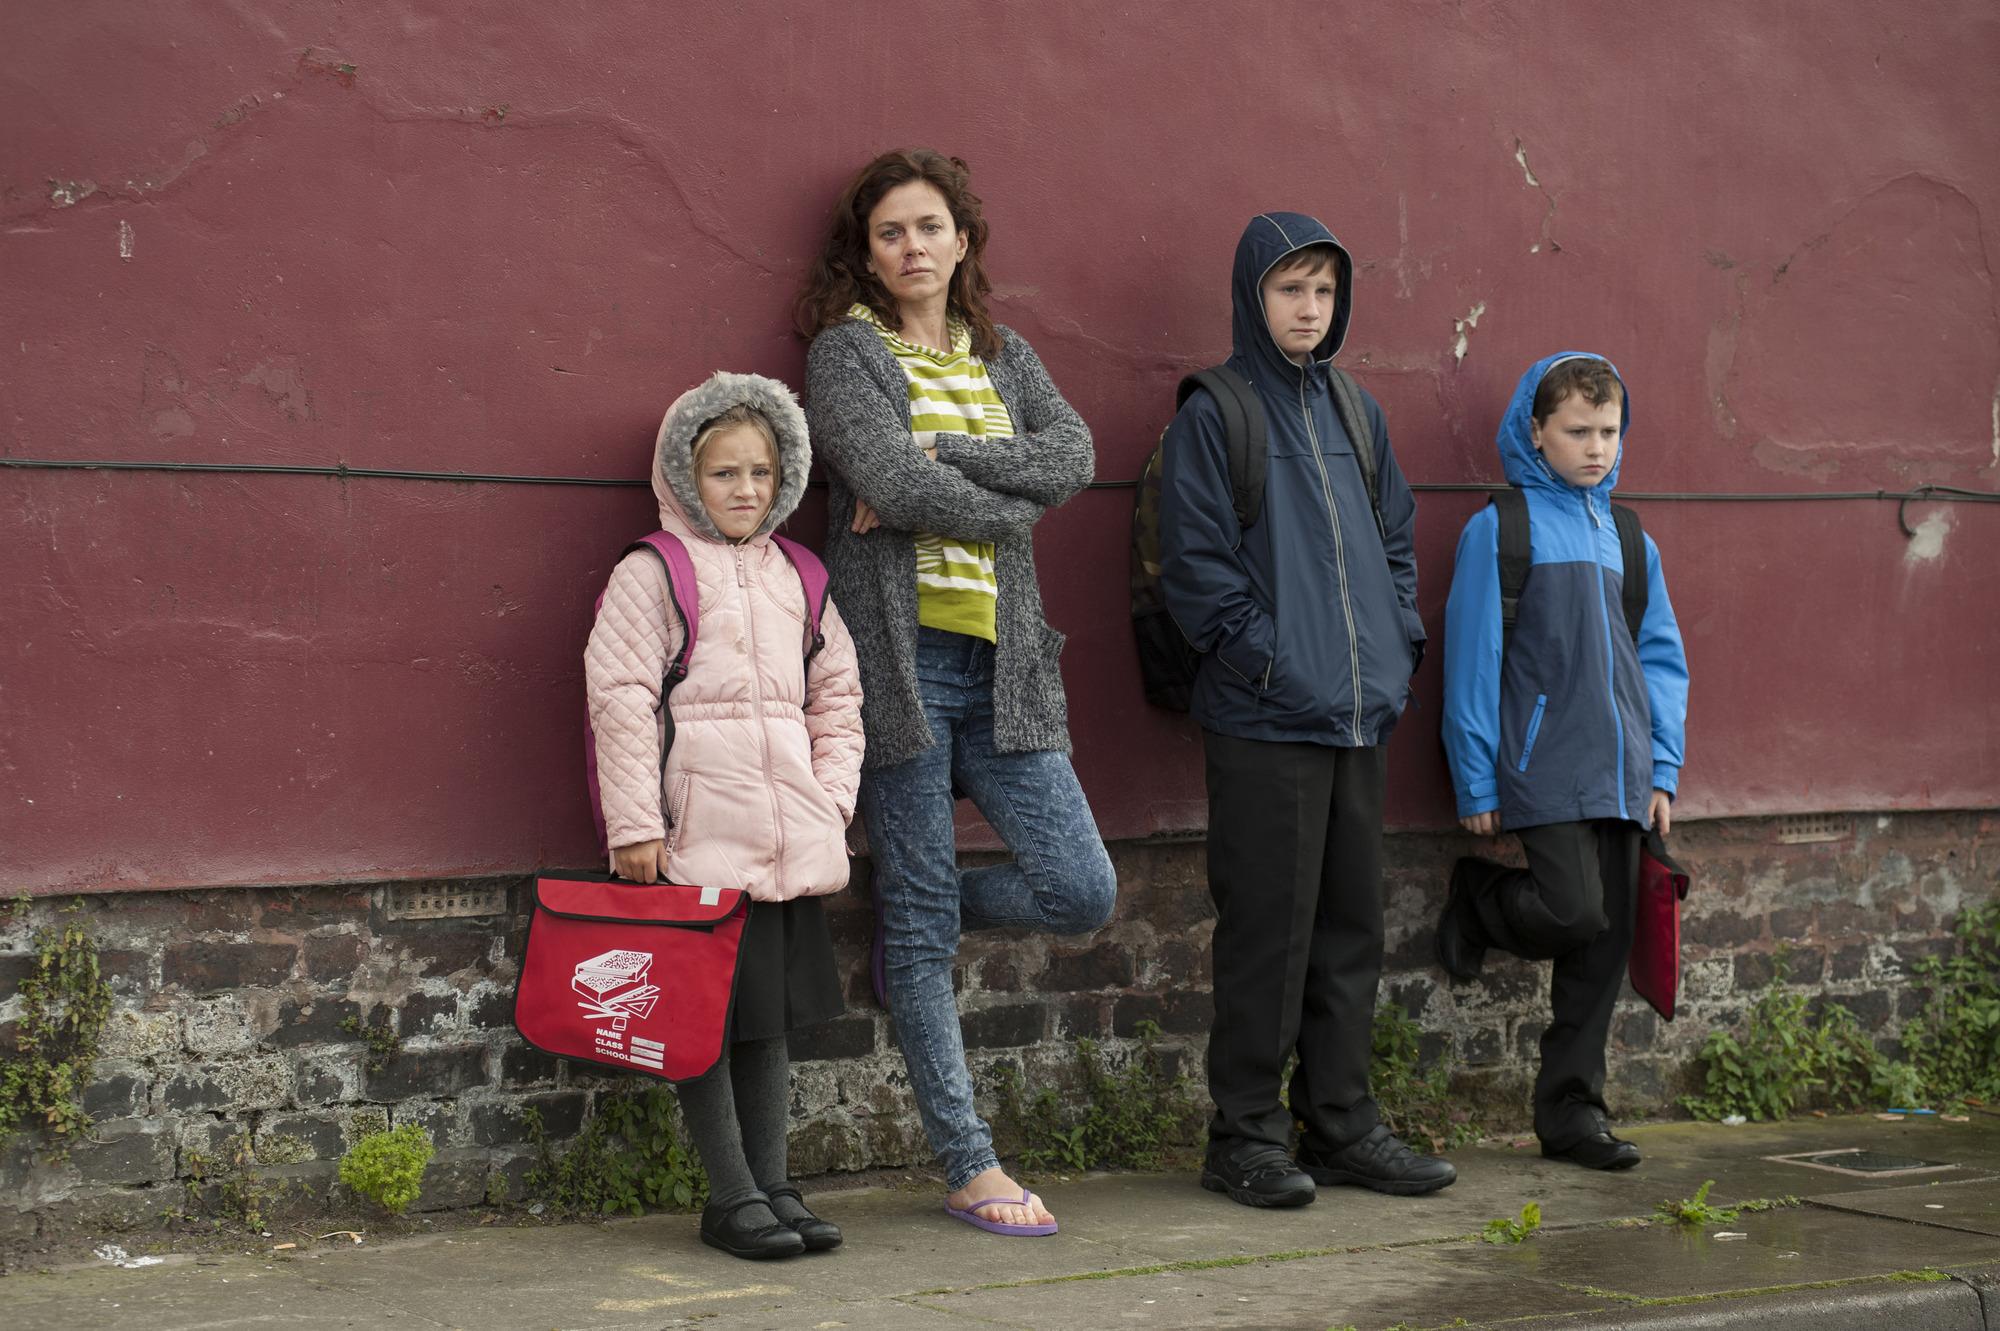 Anna Friel's BBC drama Broken has been postponed after Manchester terror attack